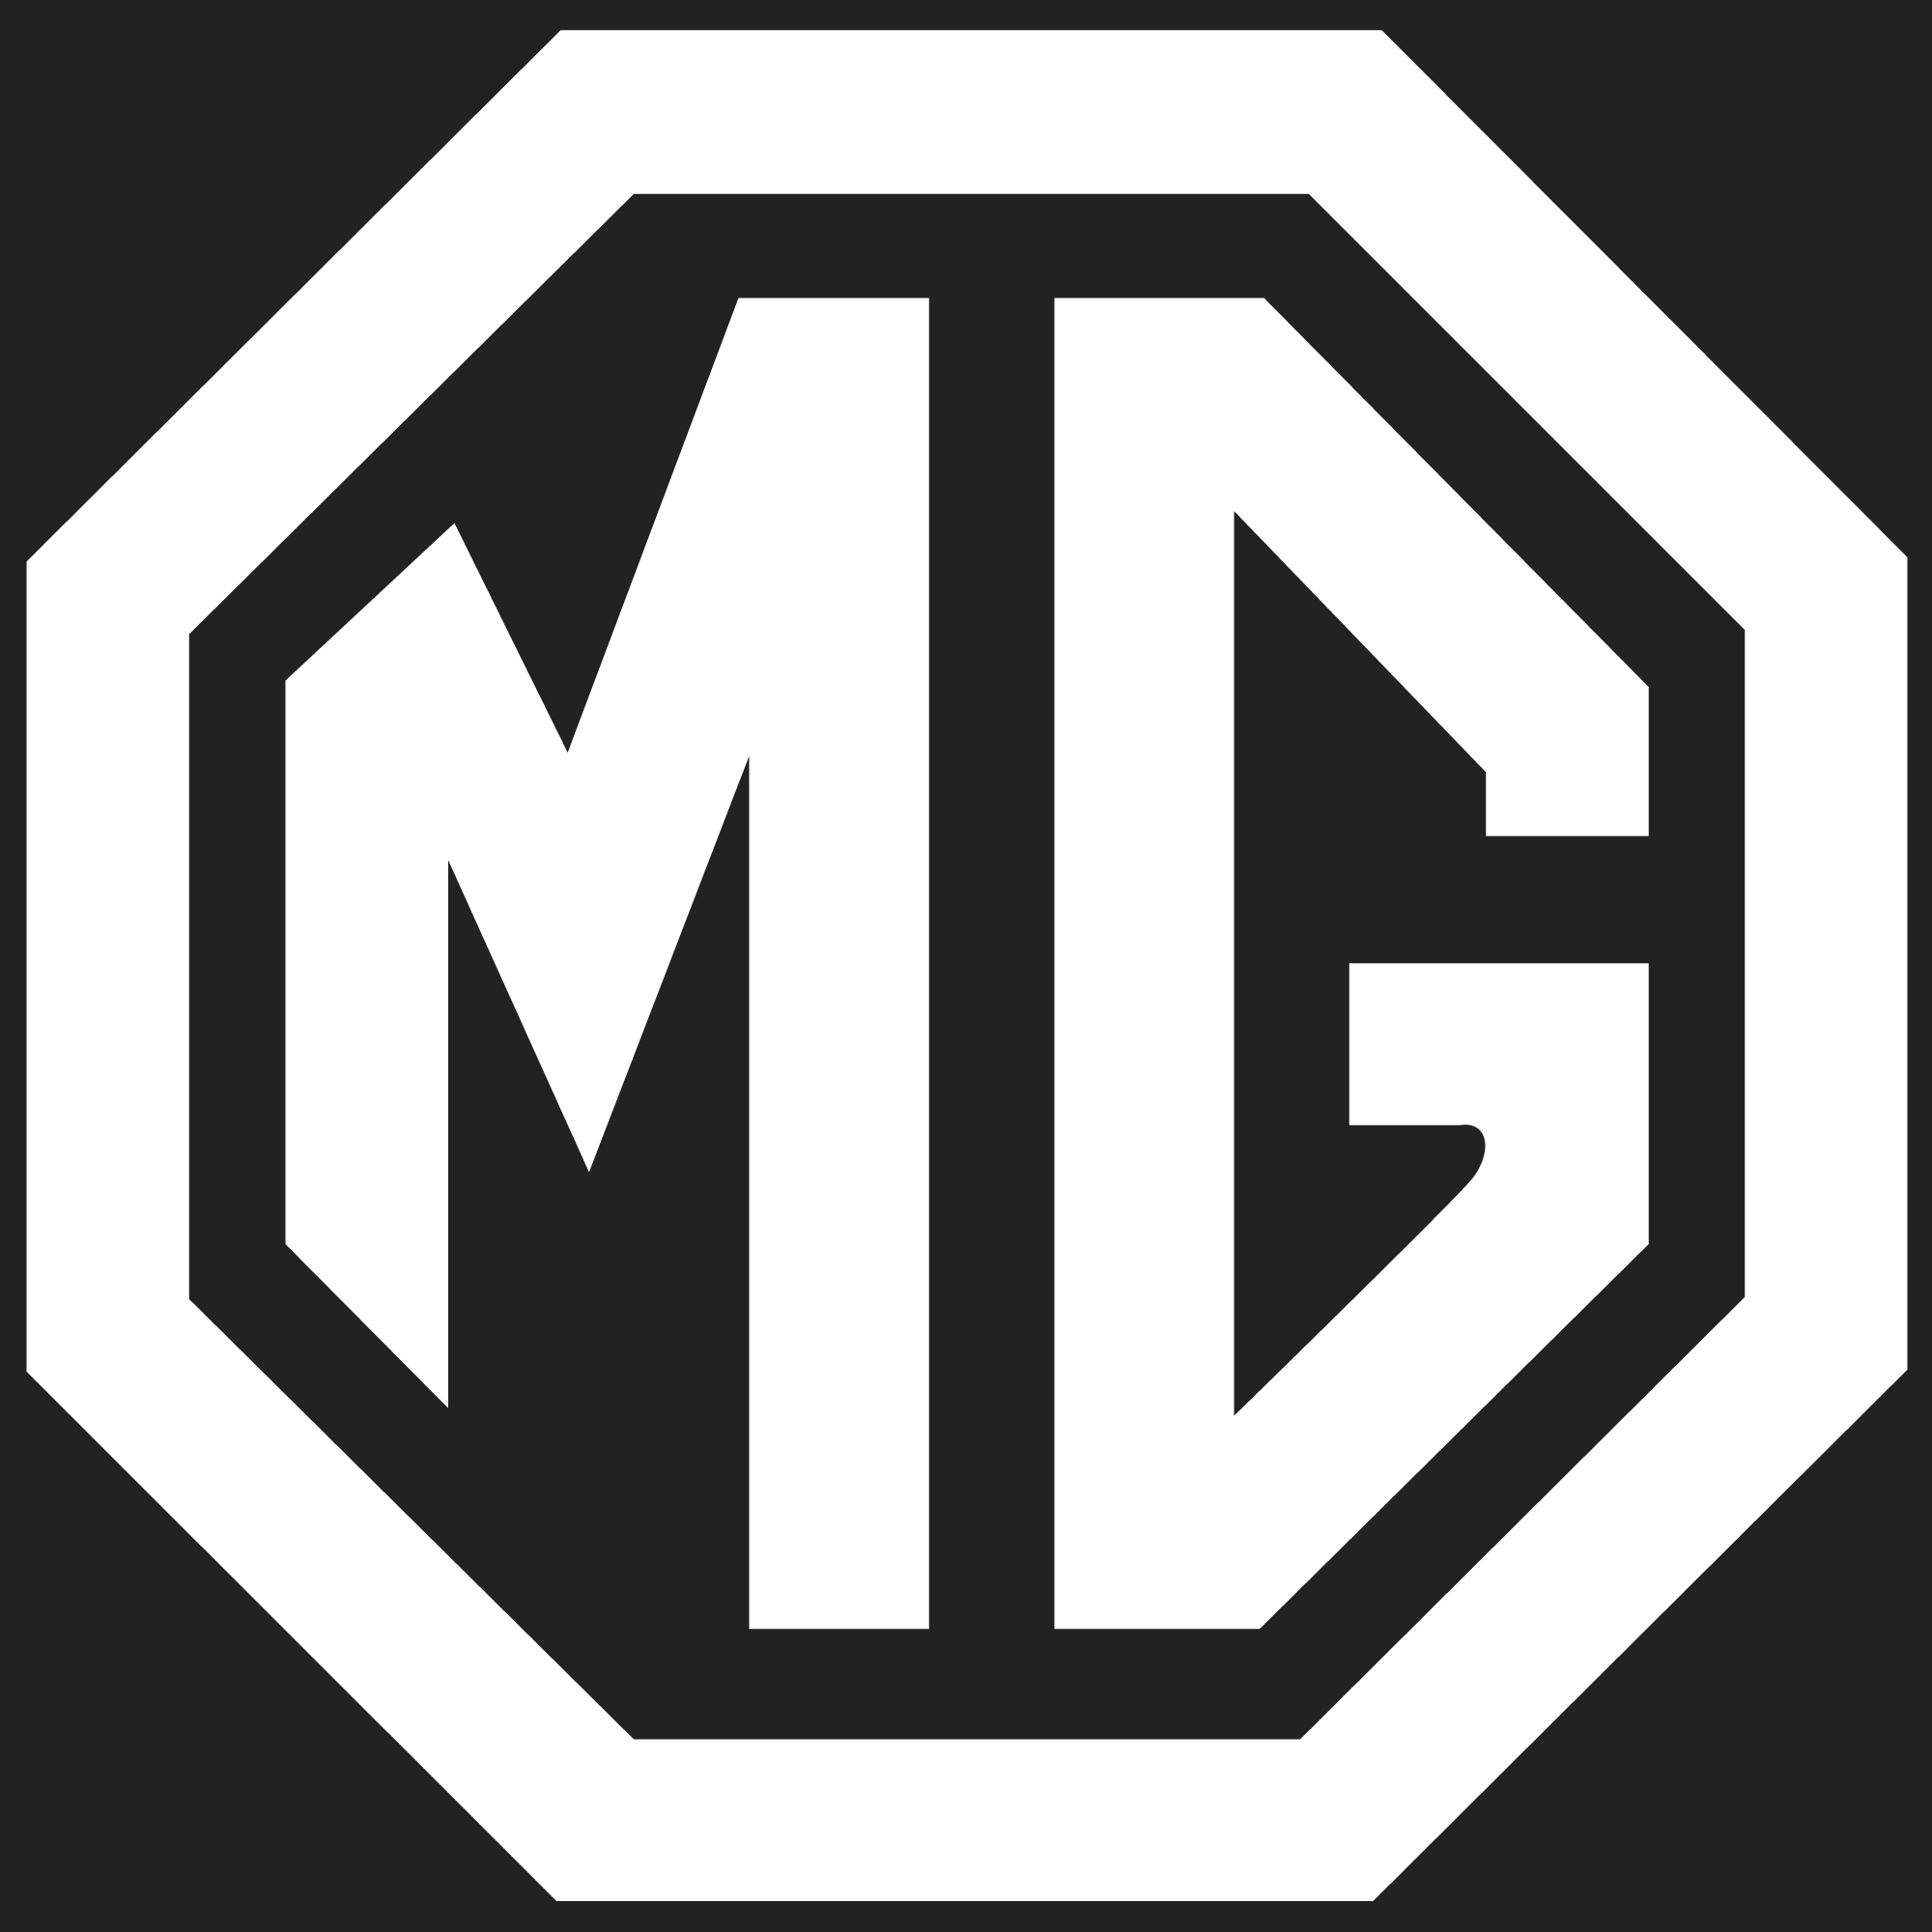 le logo voiture mg  embleme  sigle lancia